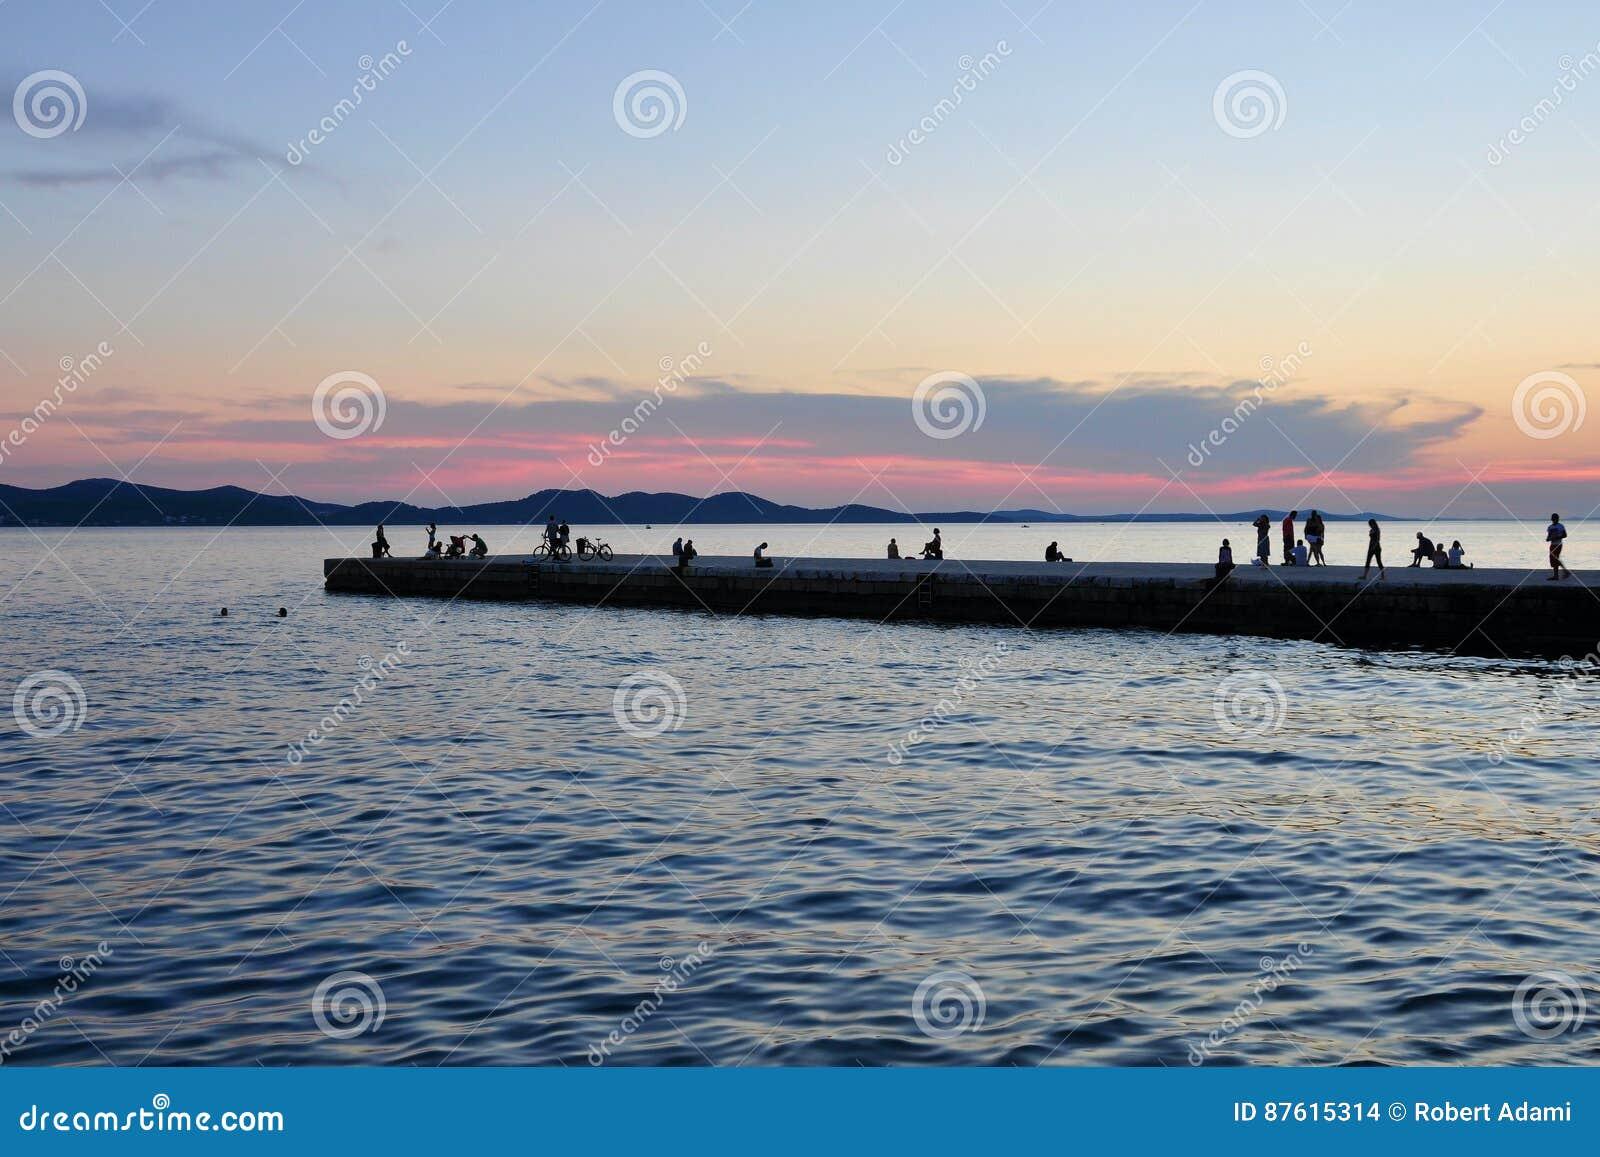 Сумрак идиллии Красивая атмосфера на пристани